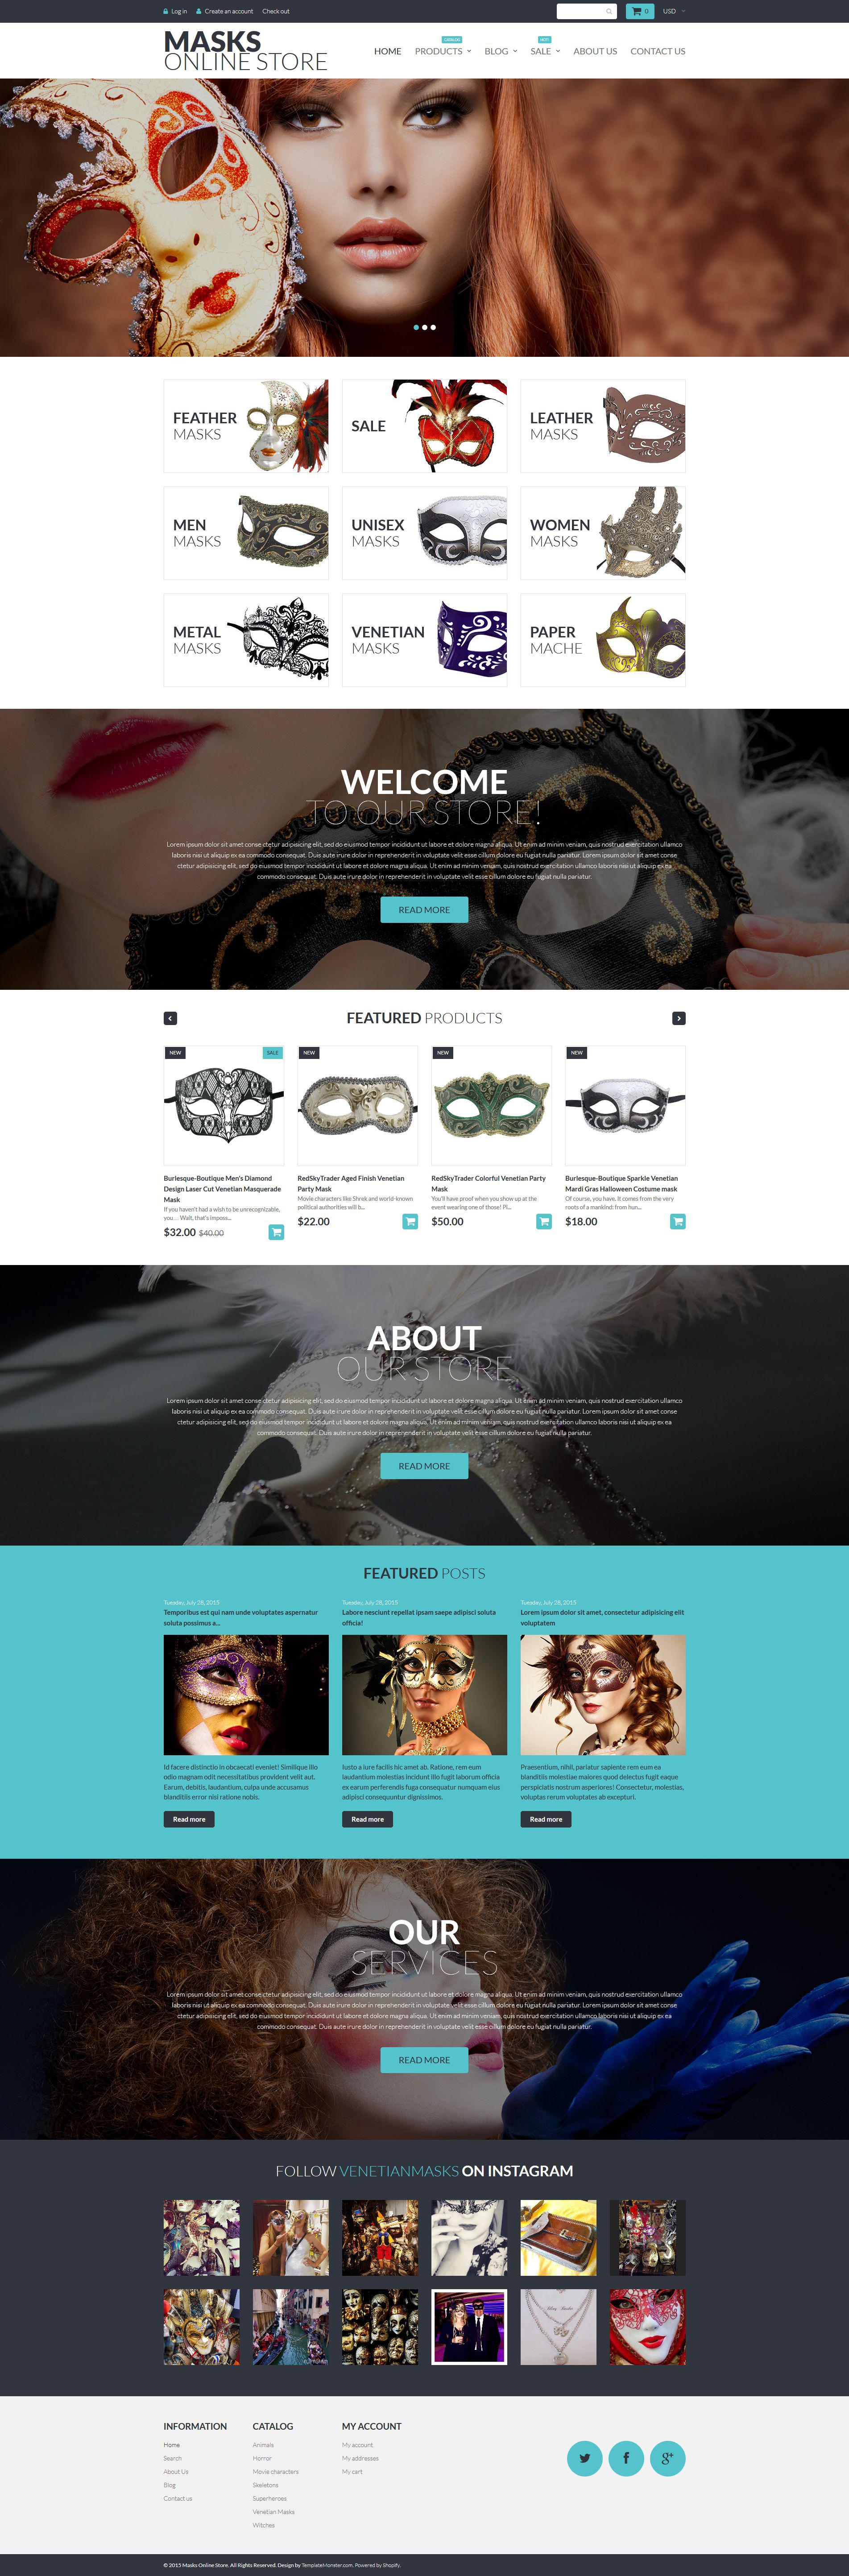 Masks Online Store Shopify Theme